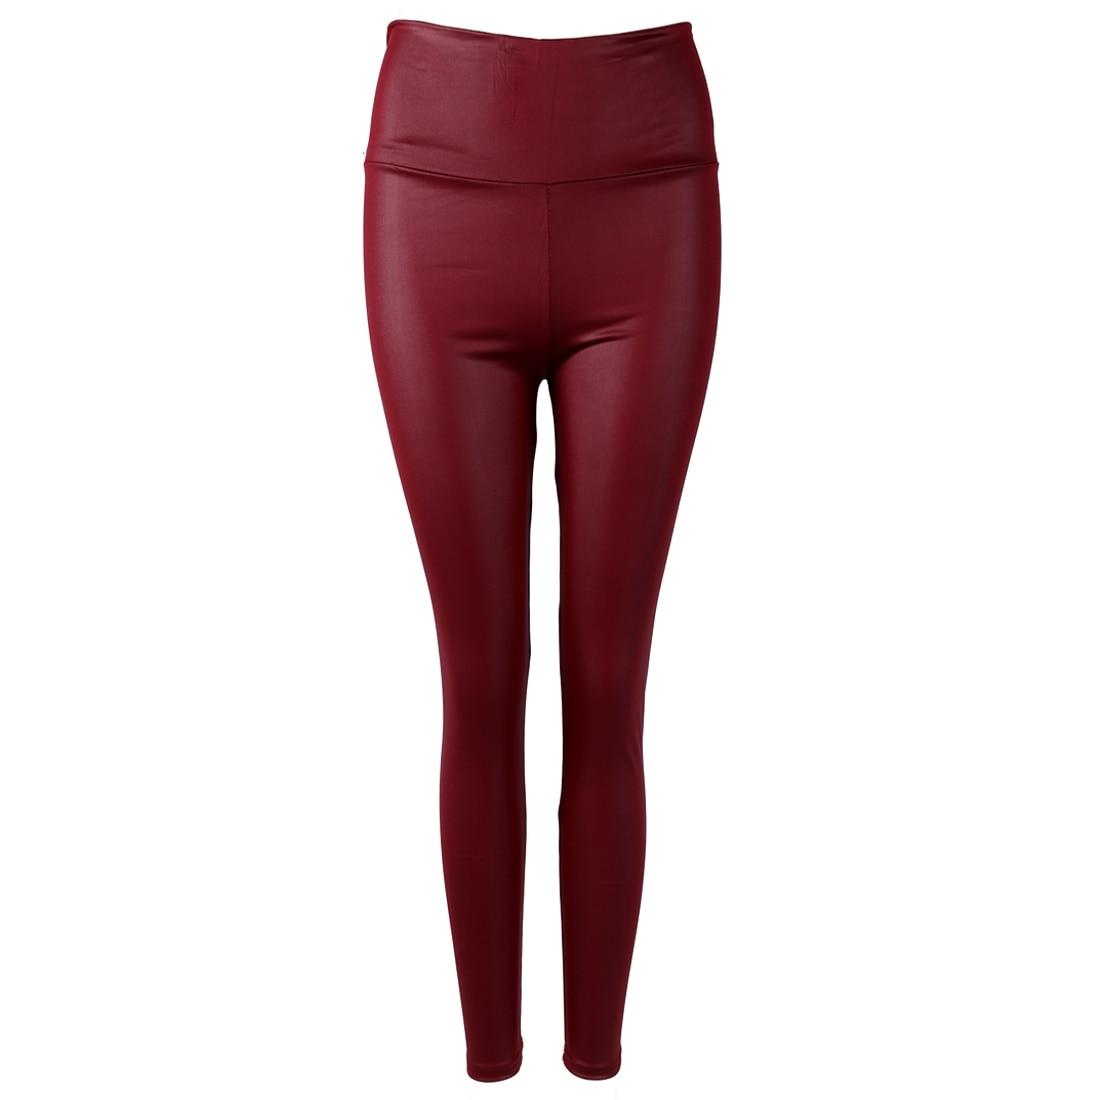 Authentic New Shiny Metallic Black Zip up Wet Stretch PU Leggings Pants S M